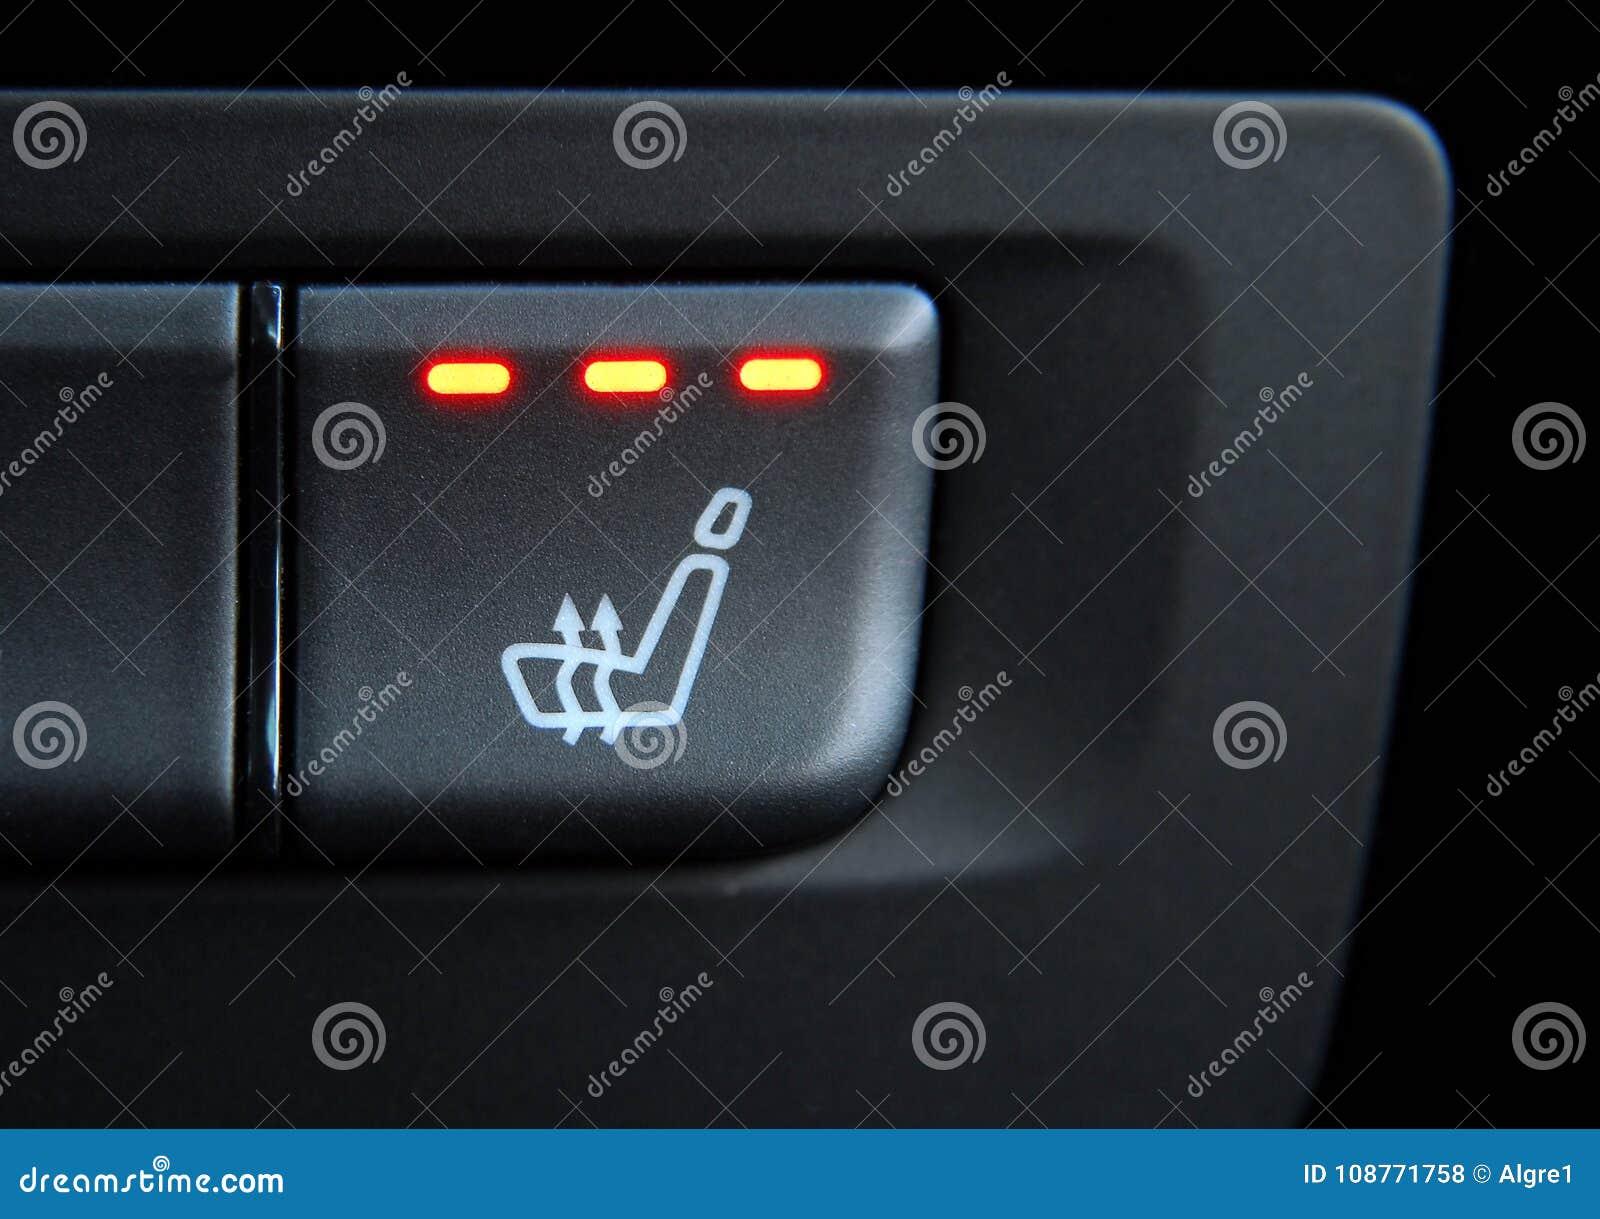 Switch Heating Car Seats